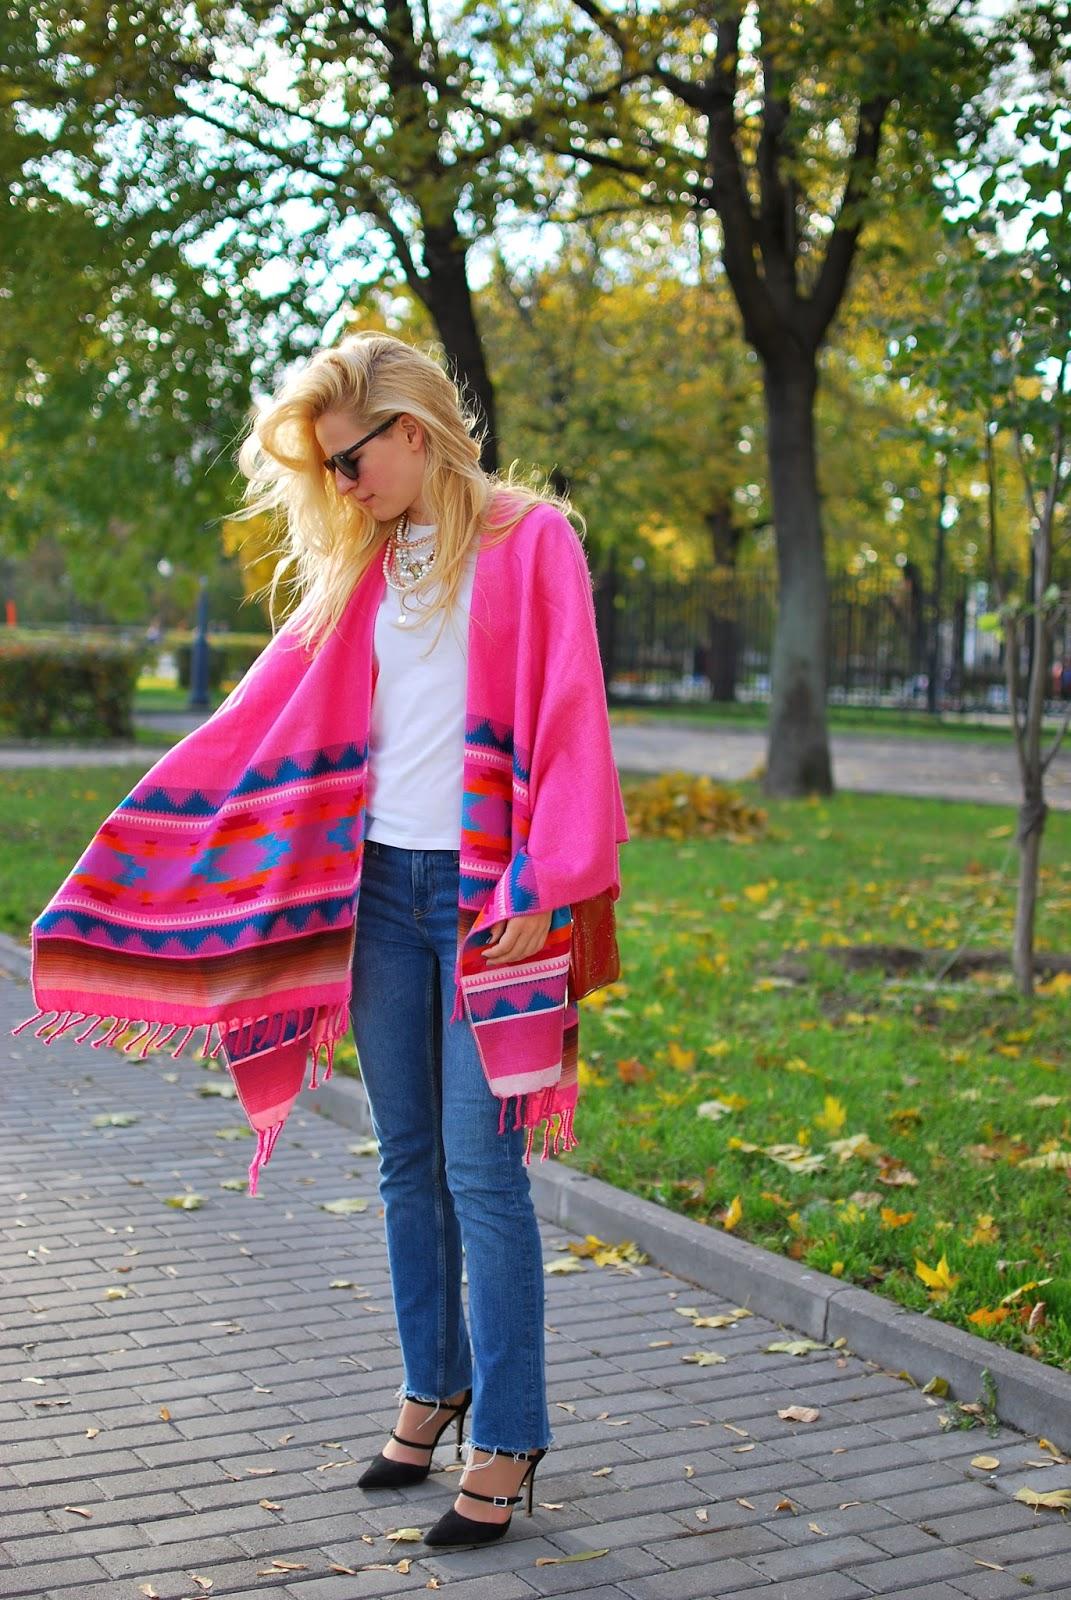 осенний лук, осенняя мода, что носить осенью, фэшн блогер